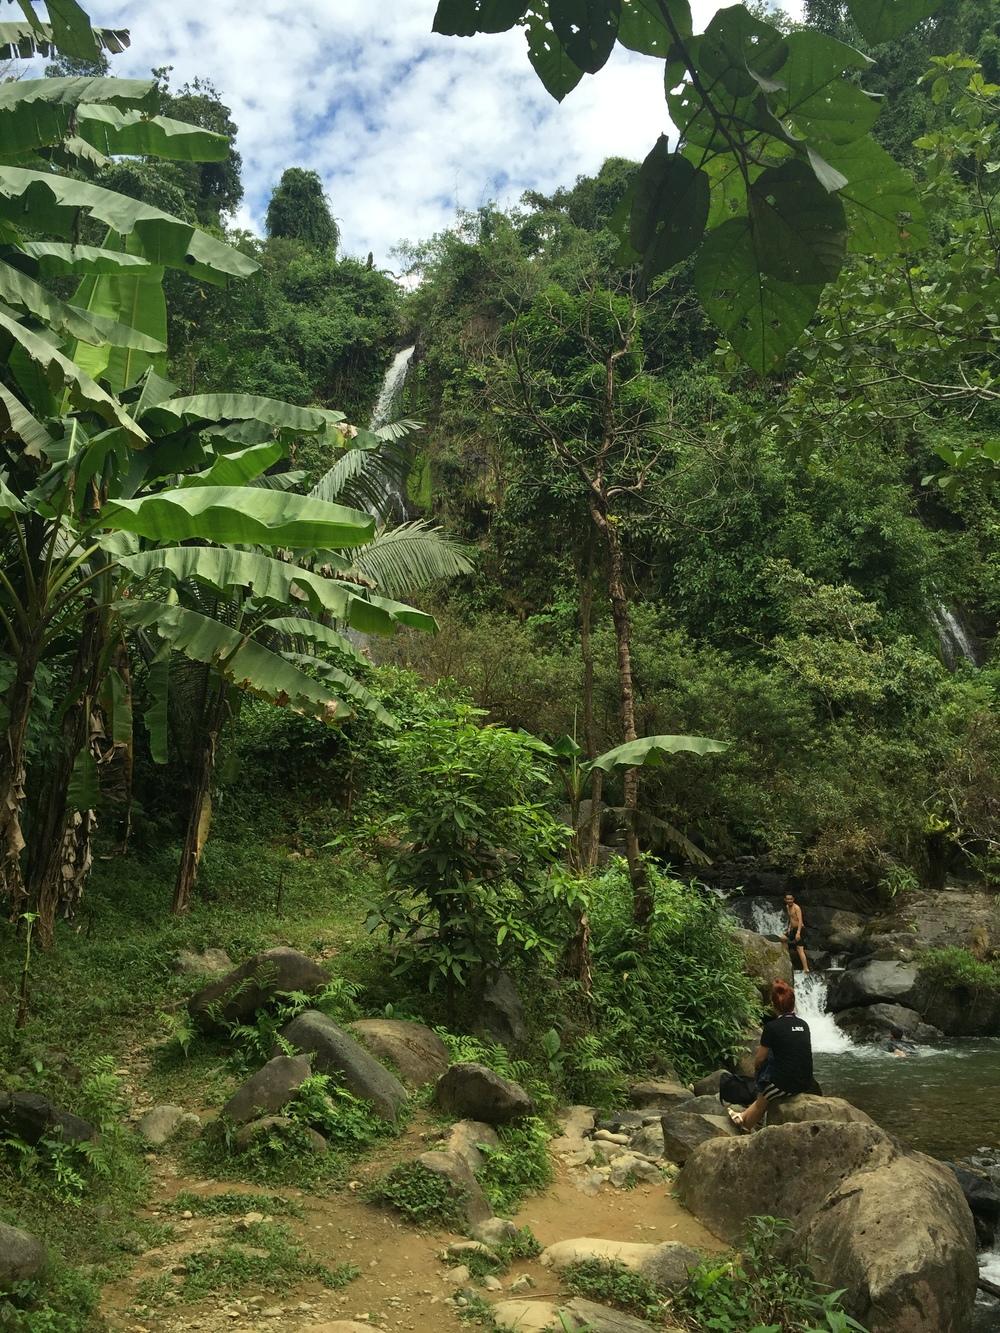 Jungles and waterfalls in Laos